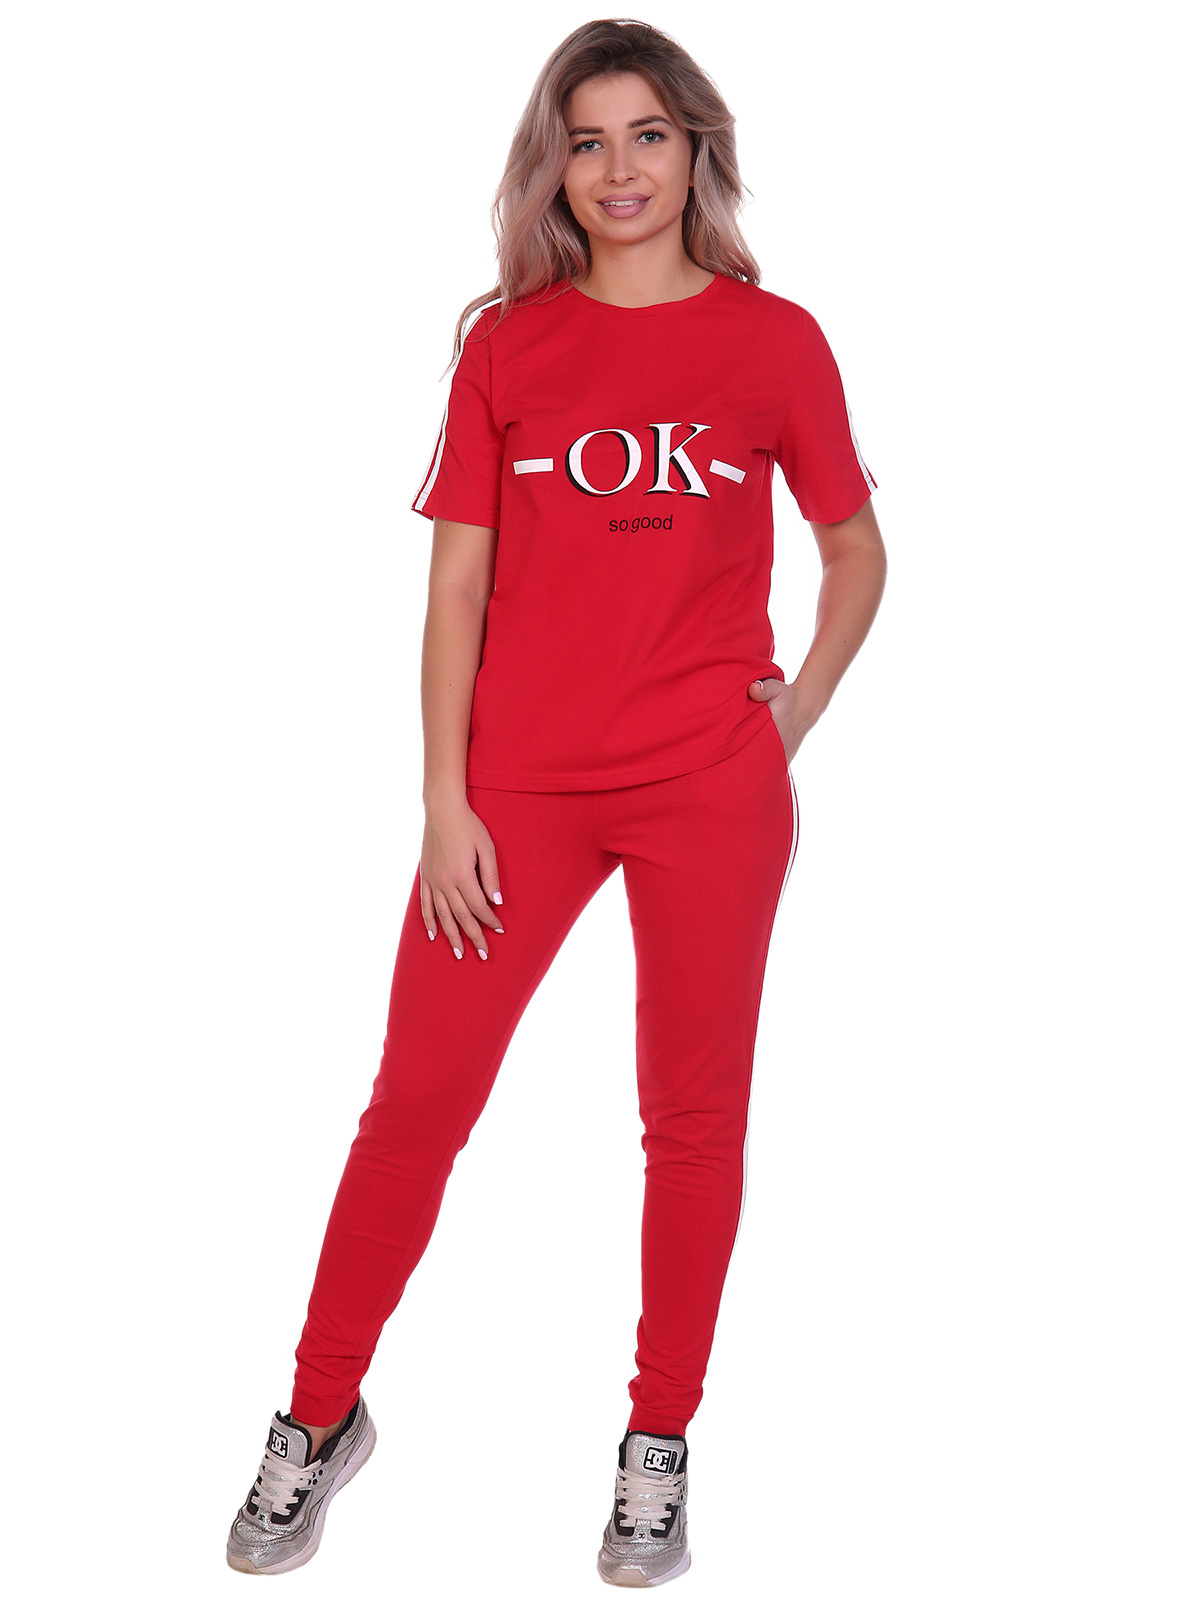 Жен. костюм арт. 16-0491 Красный р. 48 НСД Трикотаж